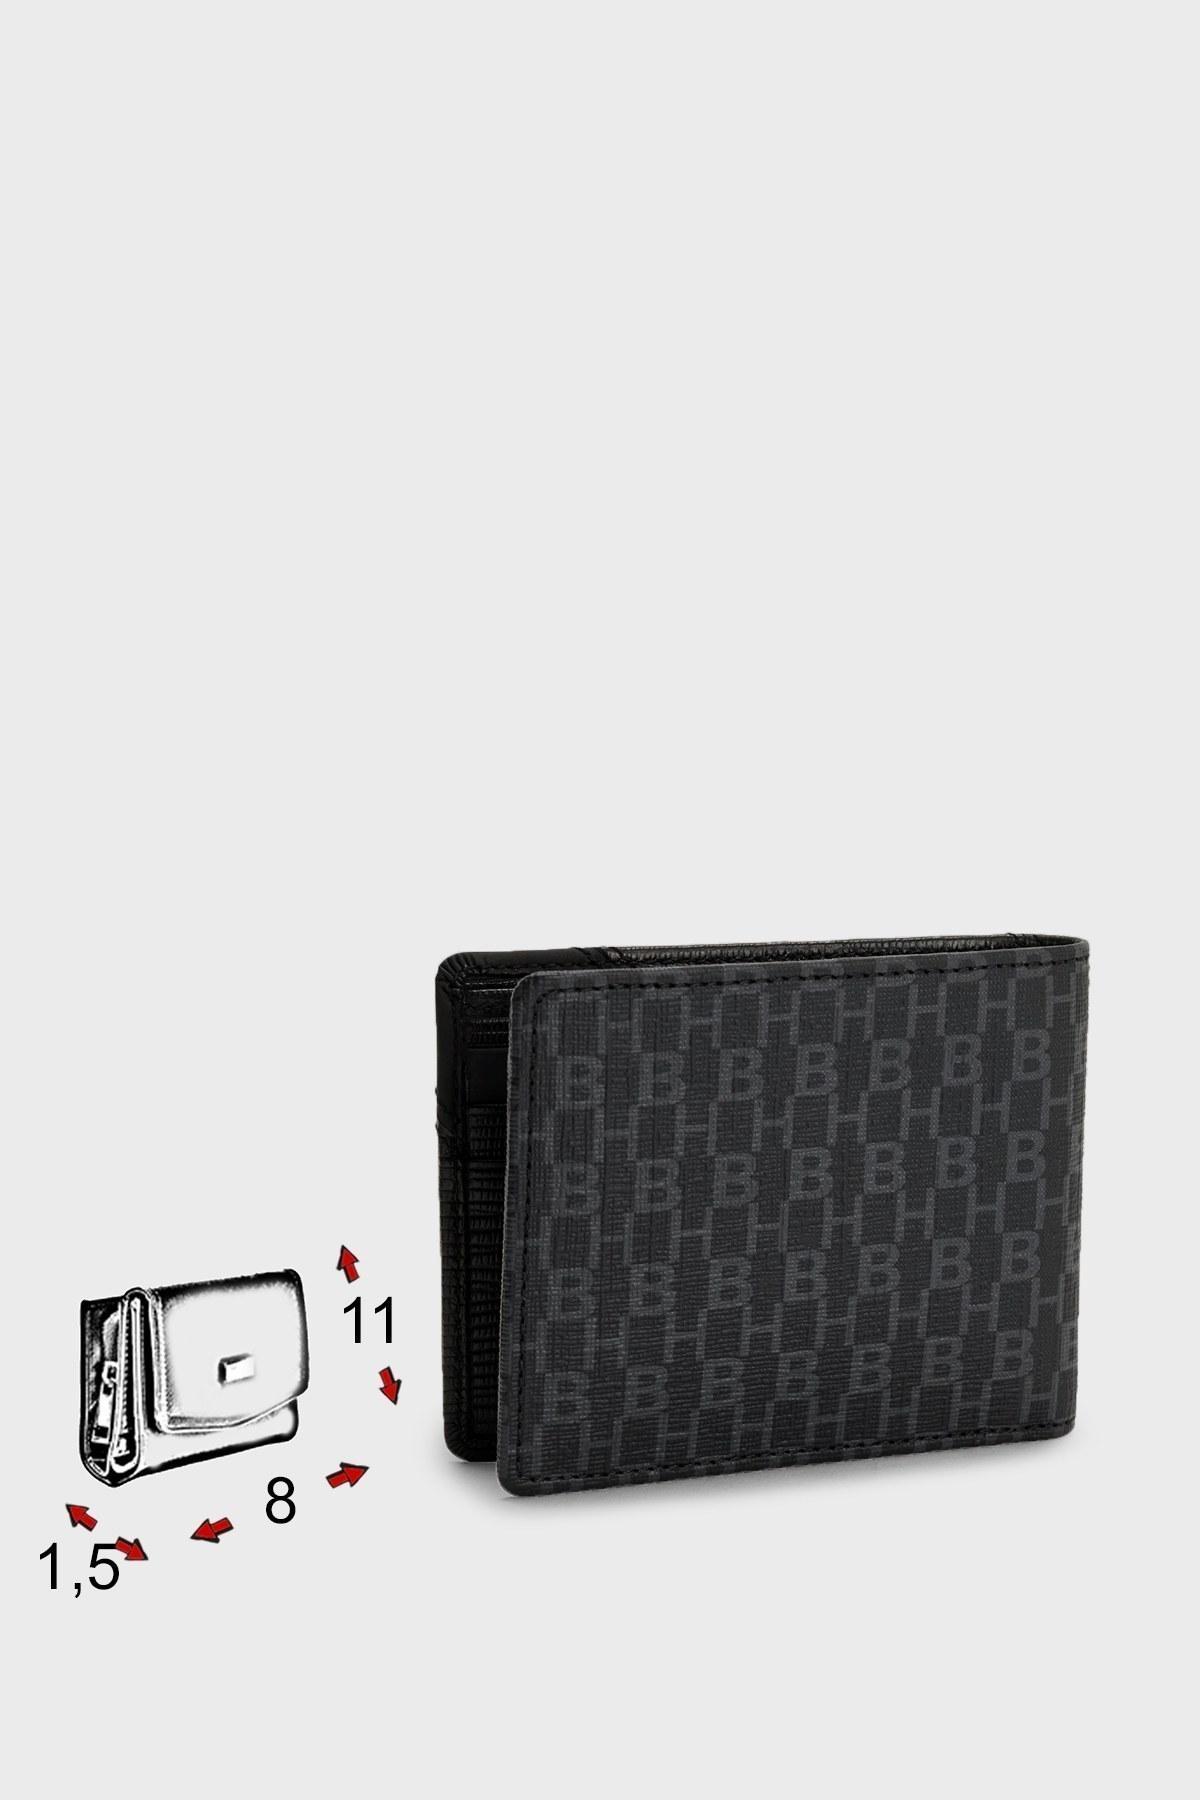 Hugo Boss Logolu Deri Erkek Cüzdan 50451633 001 SİYAH